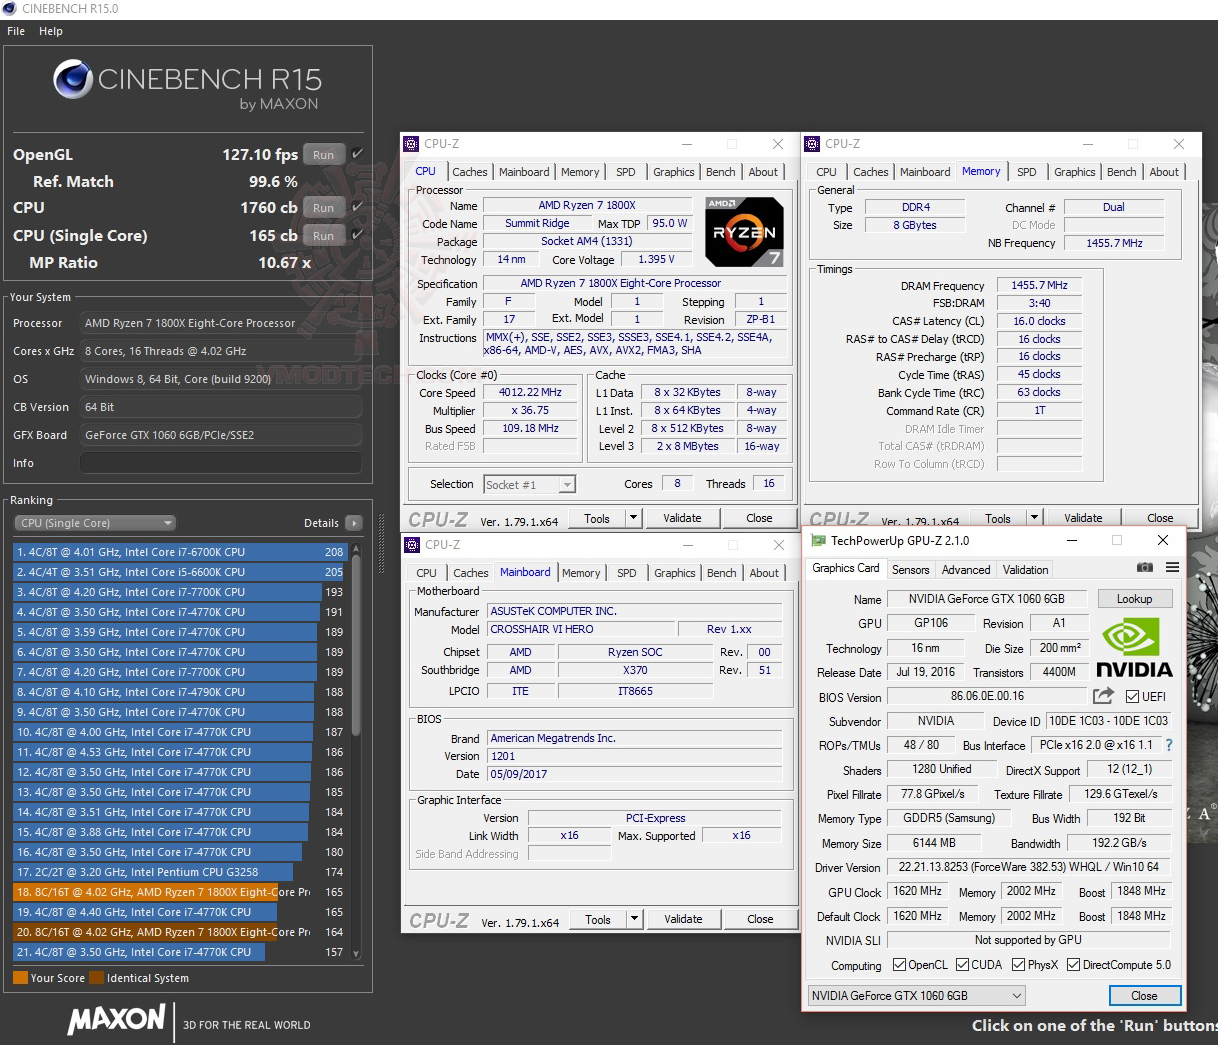 cine15 oc GEIL DDR4 2400Mhz SUPER LUCE Series AMD Edition Review